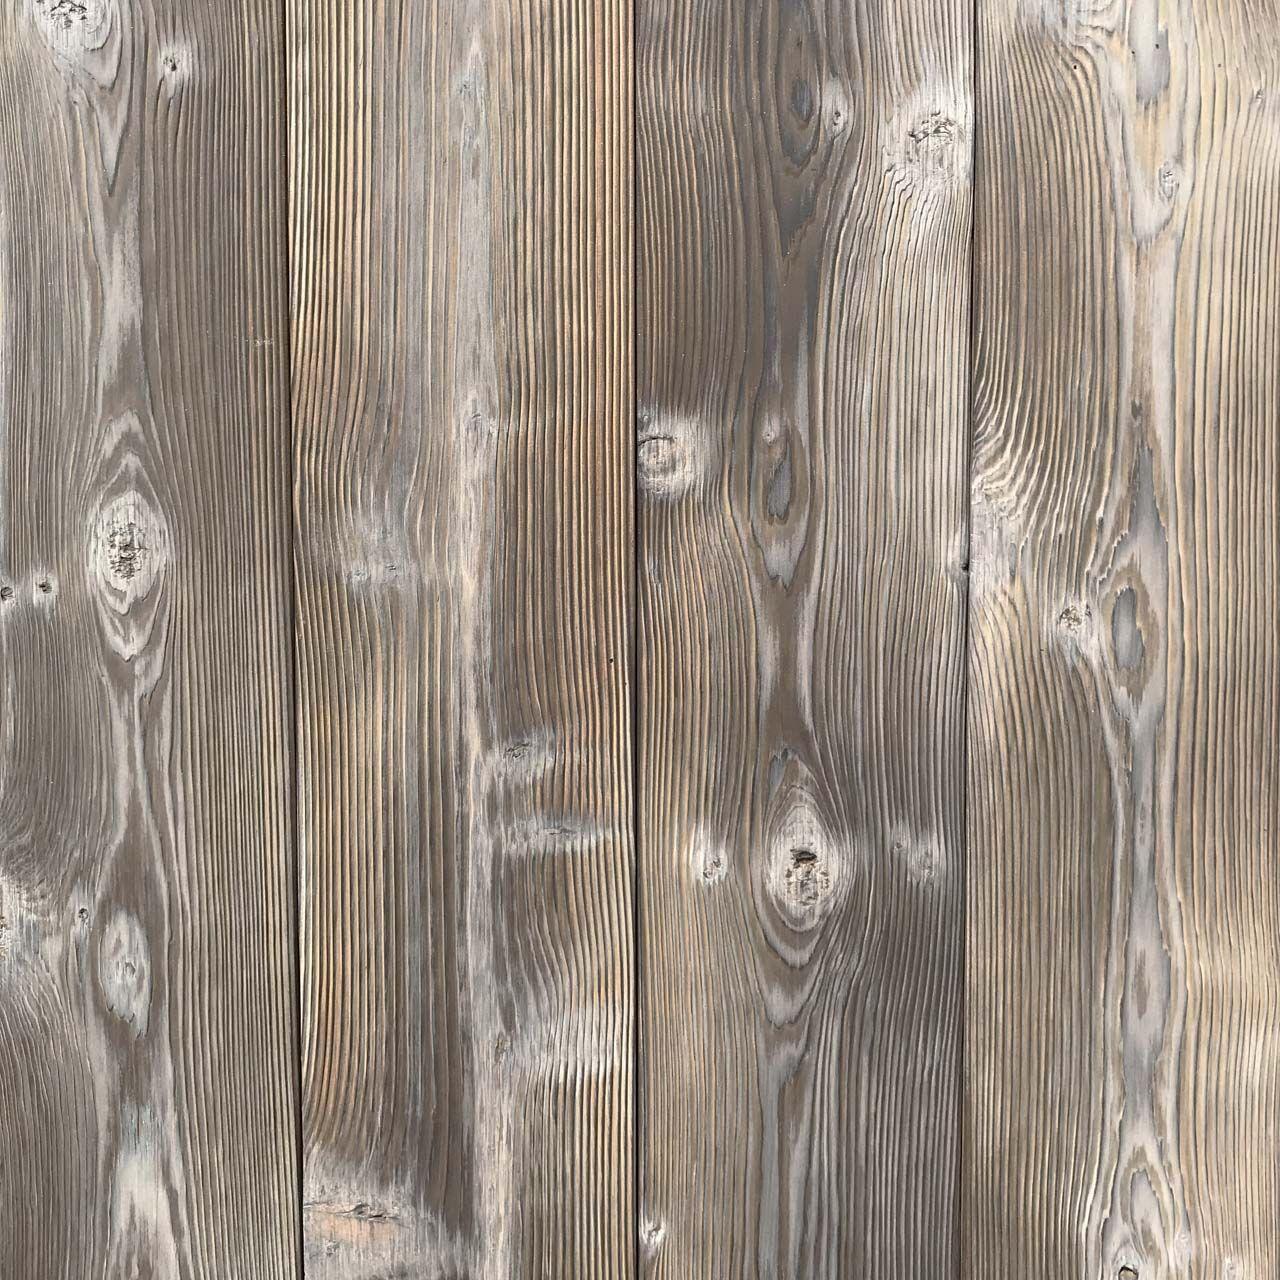 Exterior Cedar Siding Hewn Elements Cedar Siding Cedar Shake Siding Cedar Walls